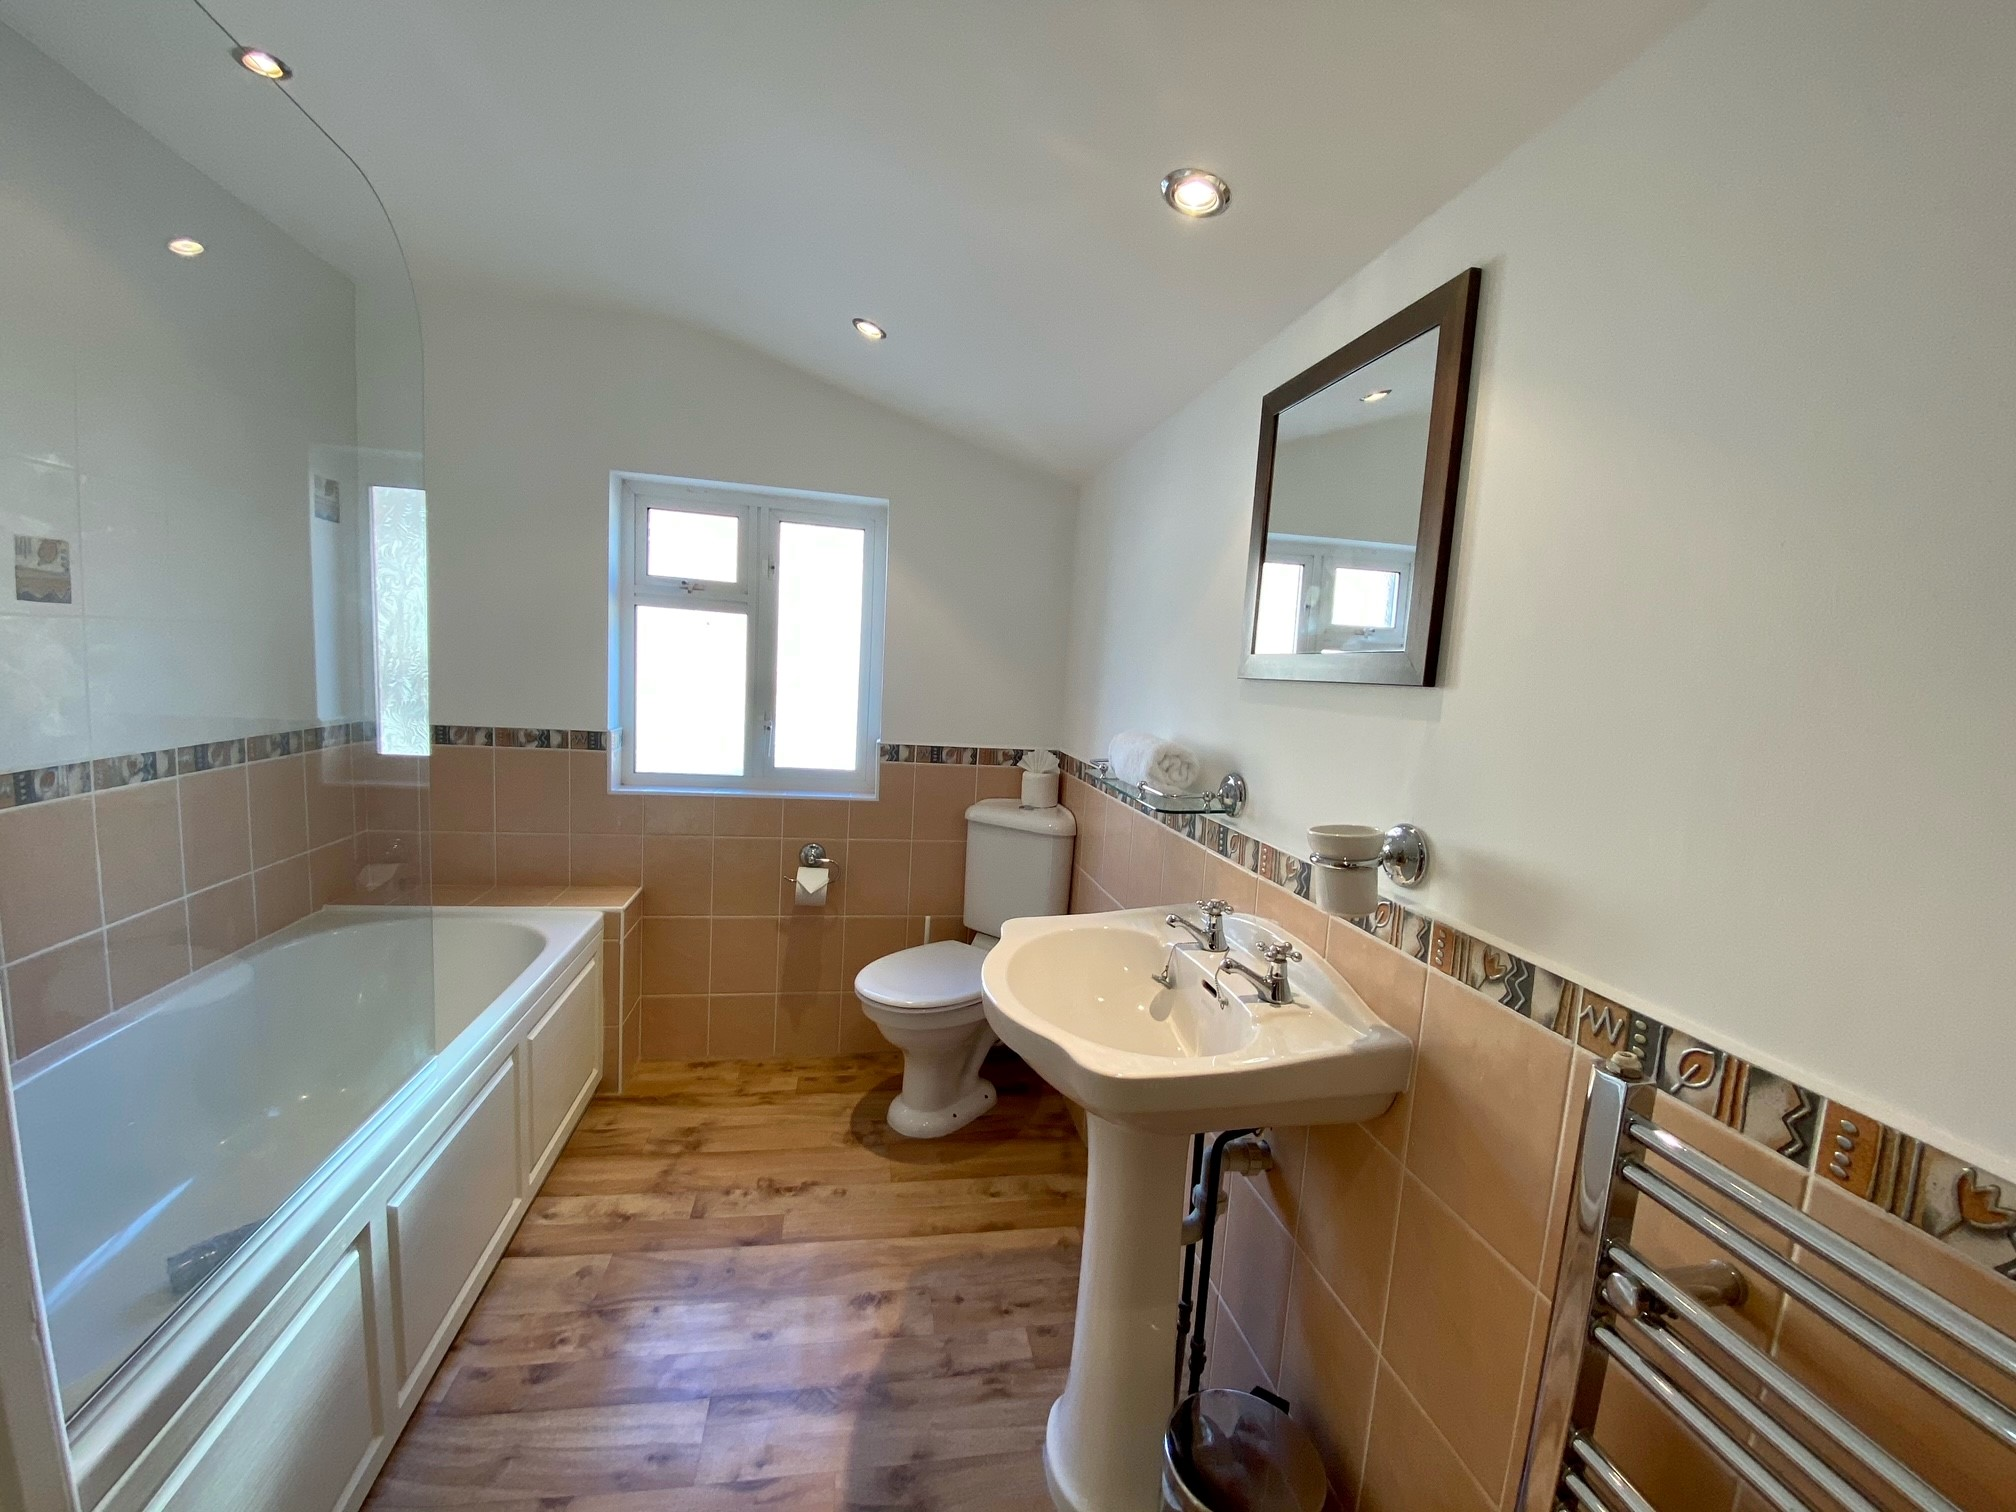 Killick Bathroom